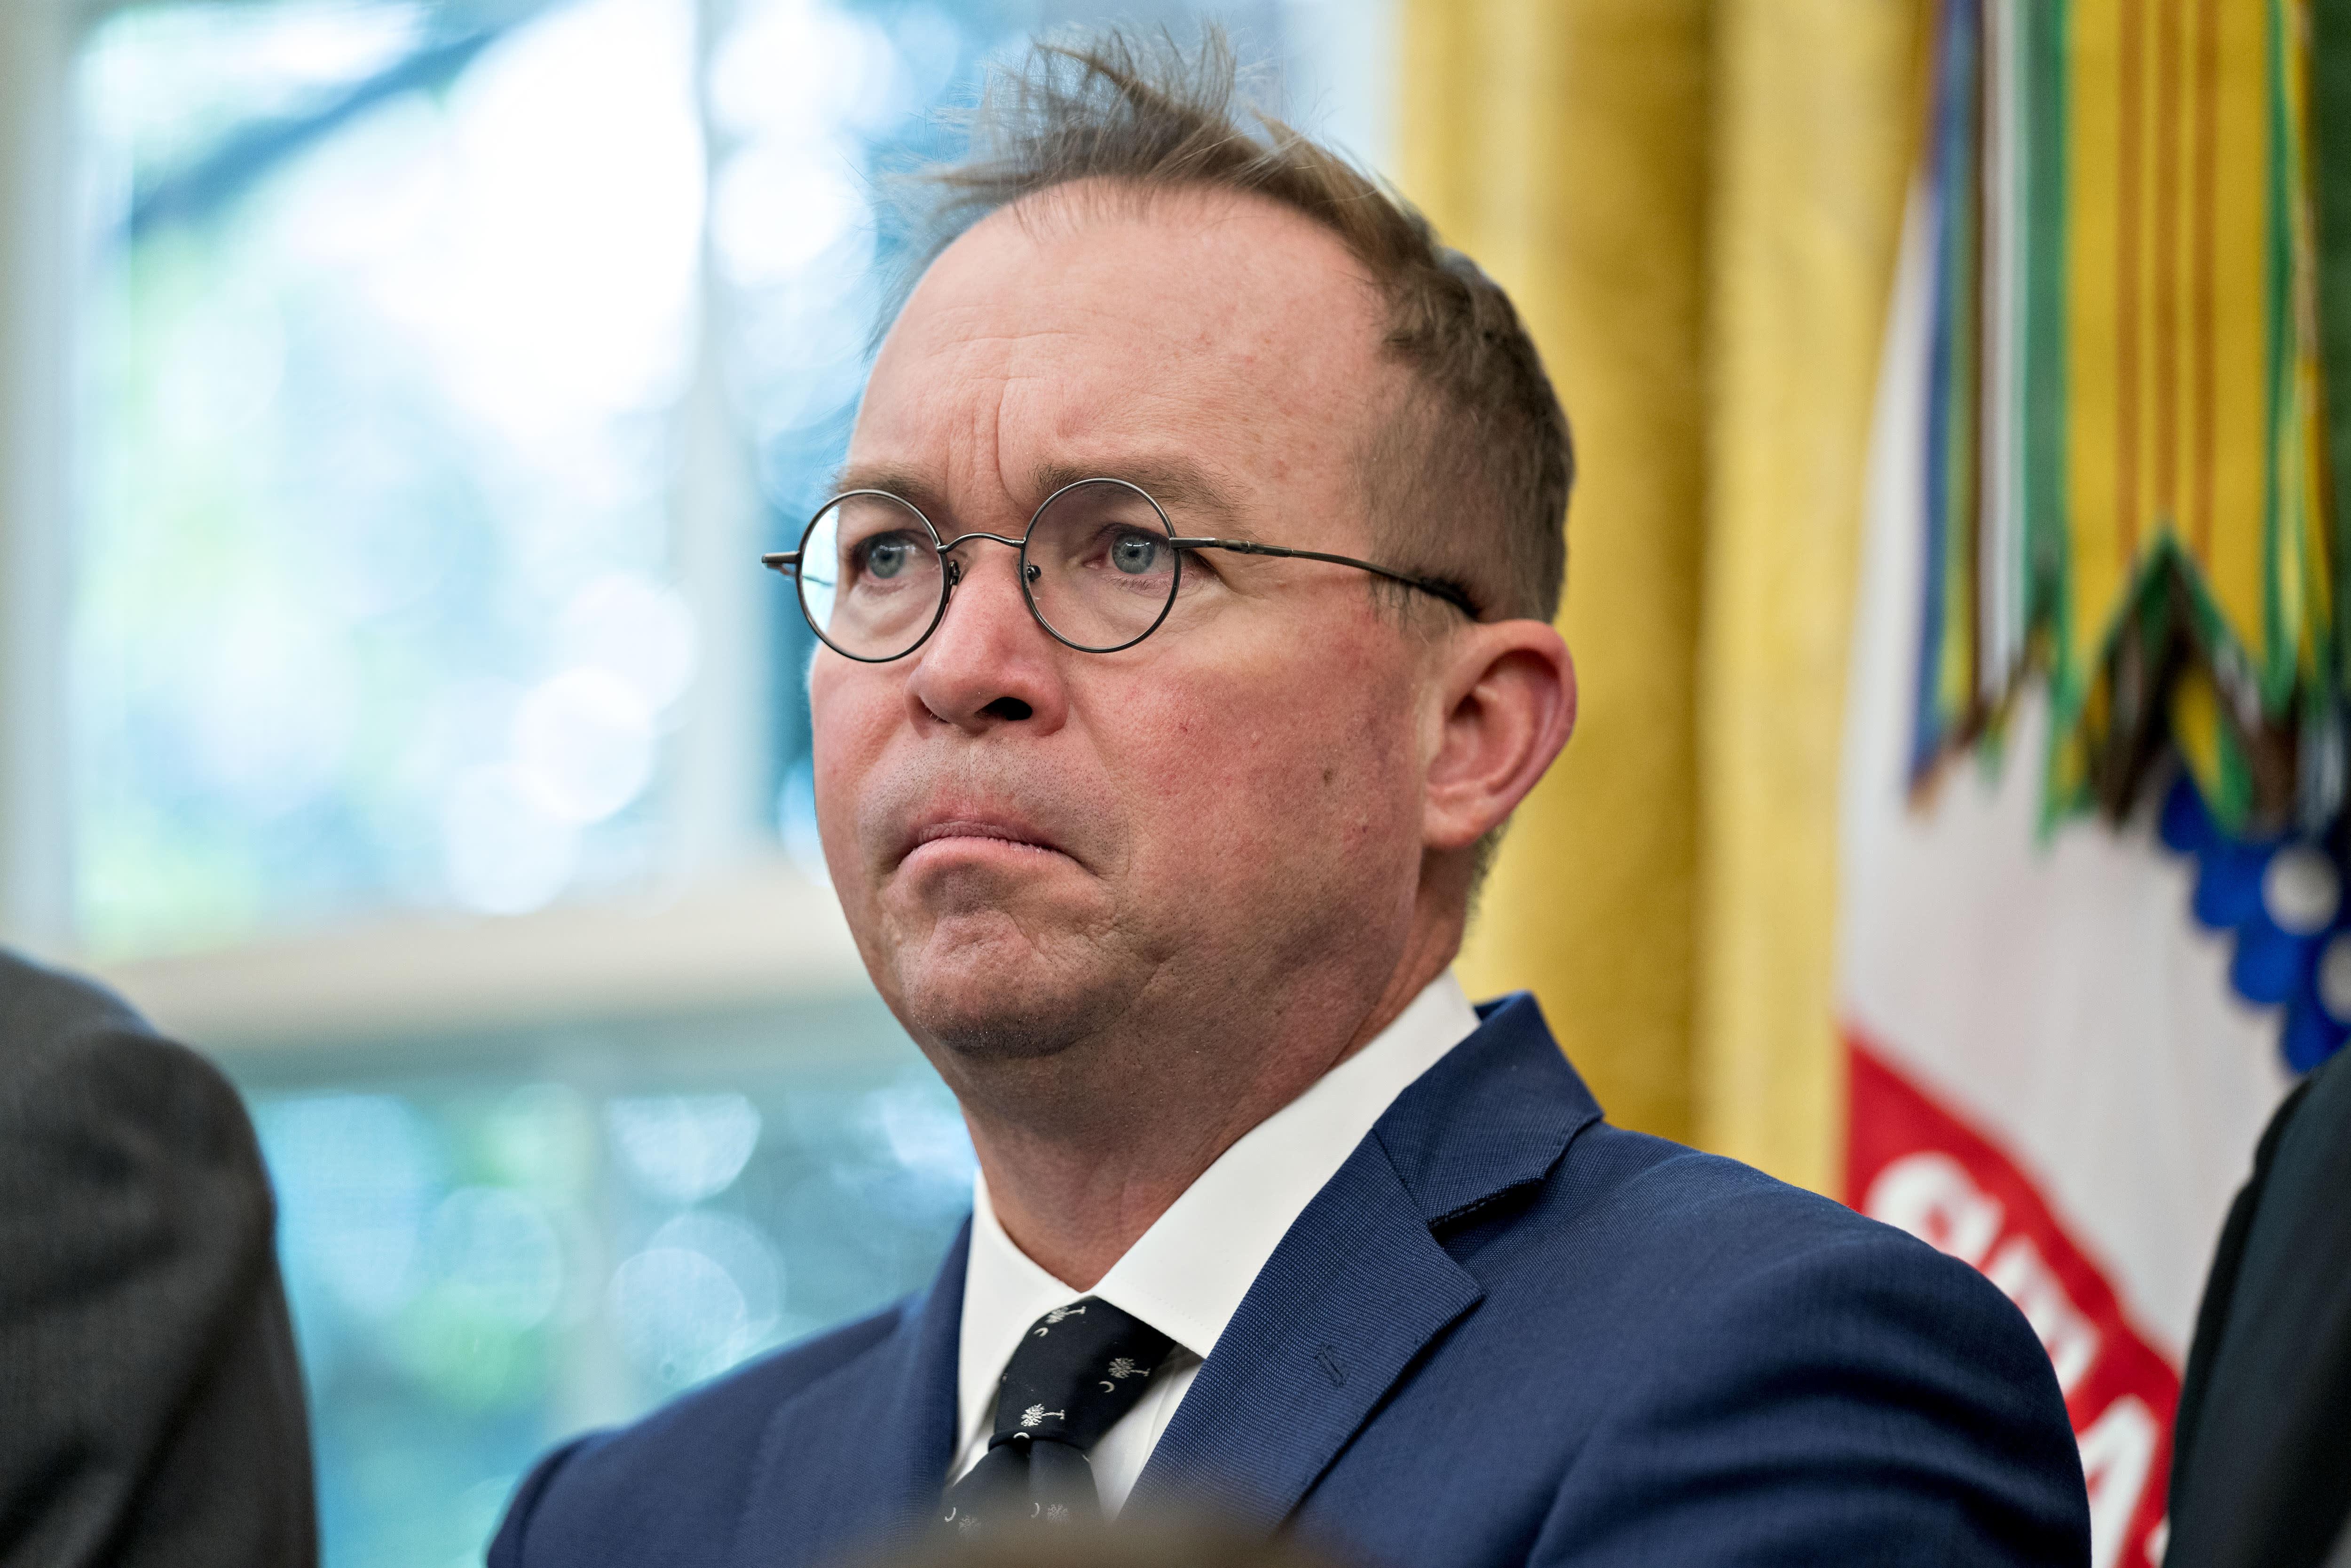 House Democrats subpoena Mick Mulvaney in impeachment probe